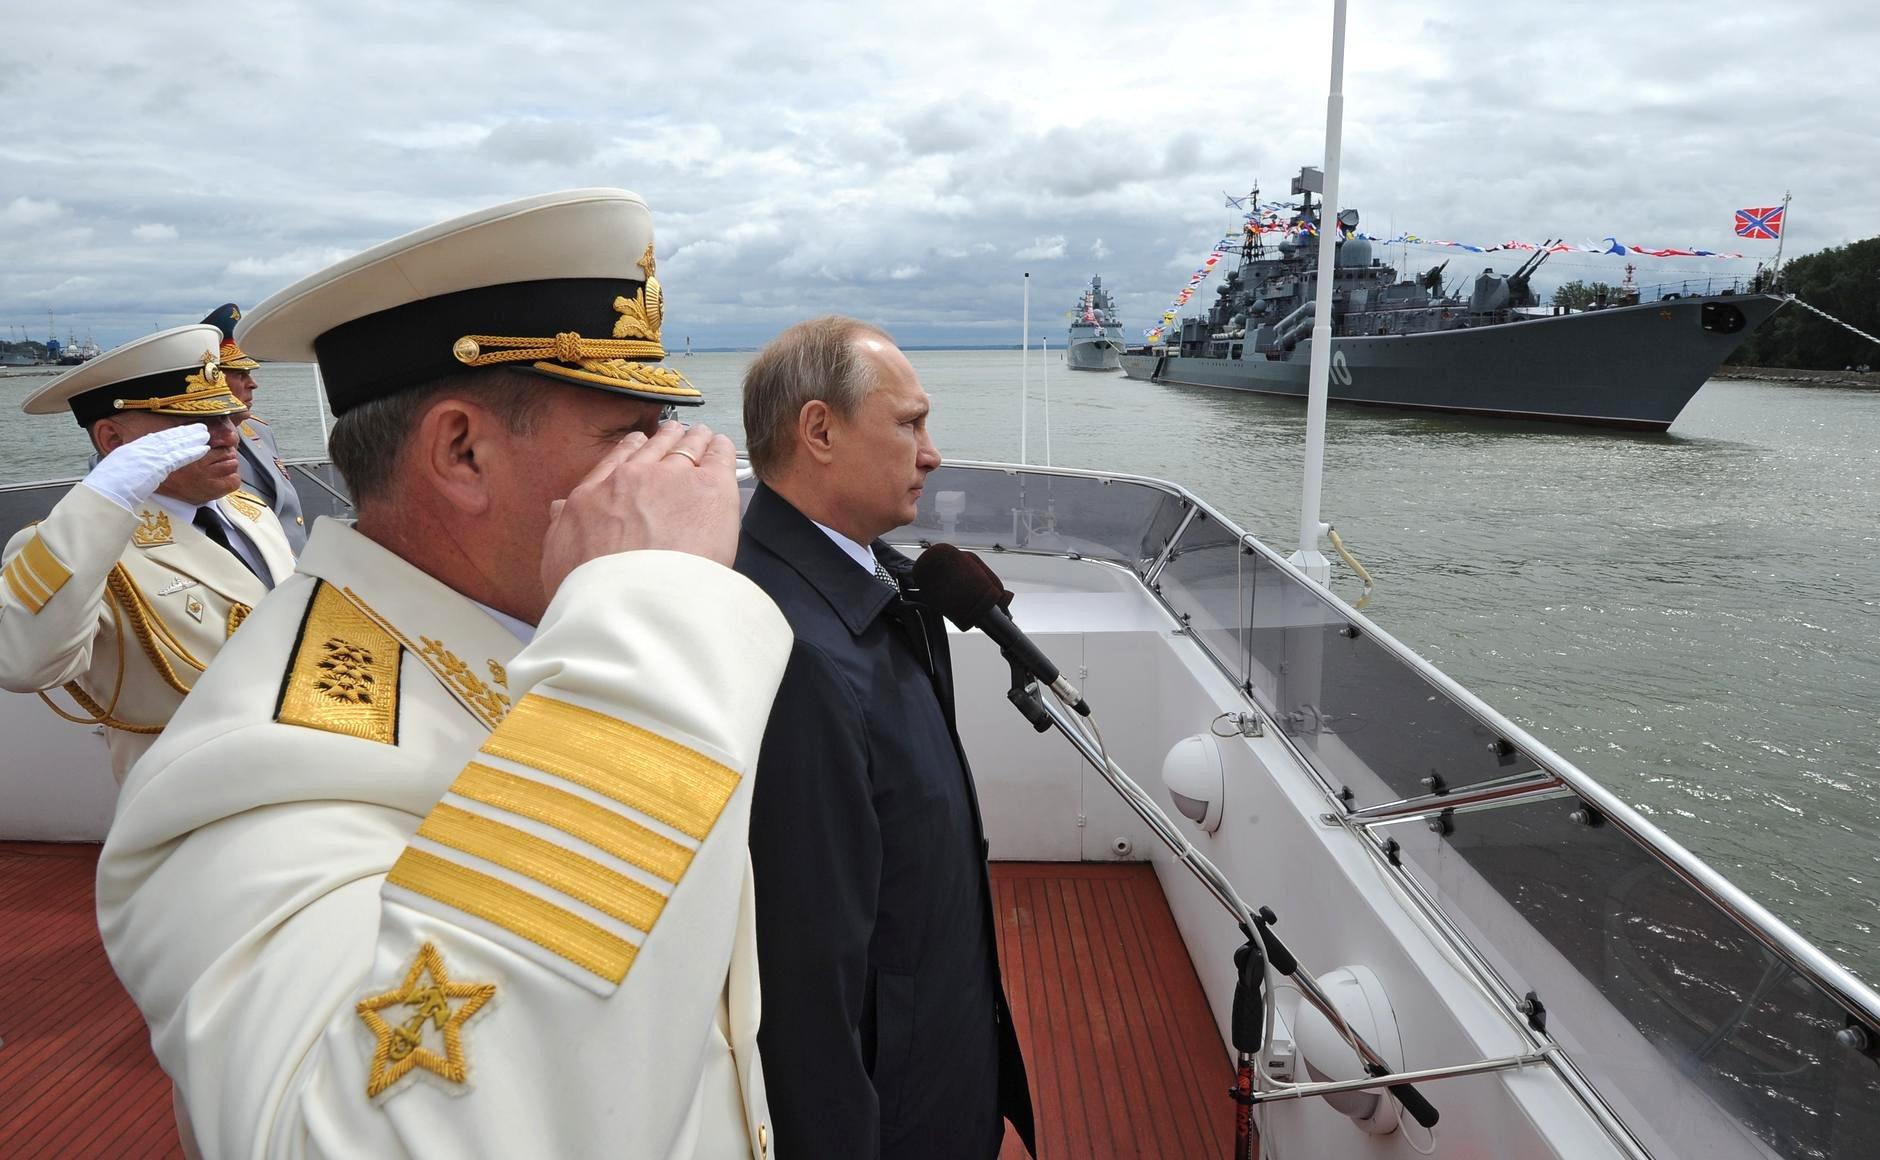 navy_day_in_baltiysk2c_282015-07-2629_03